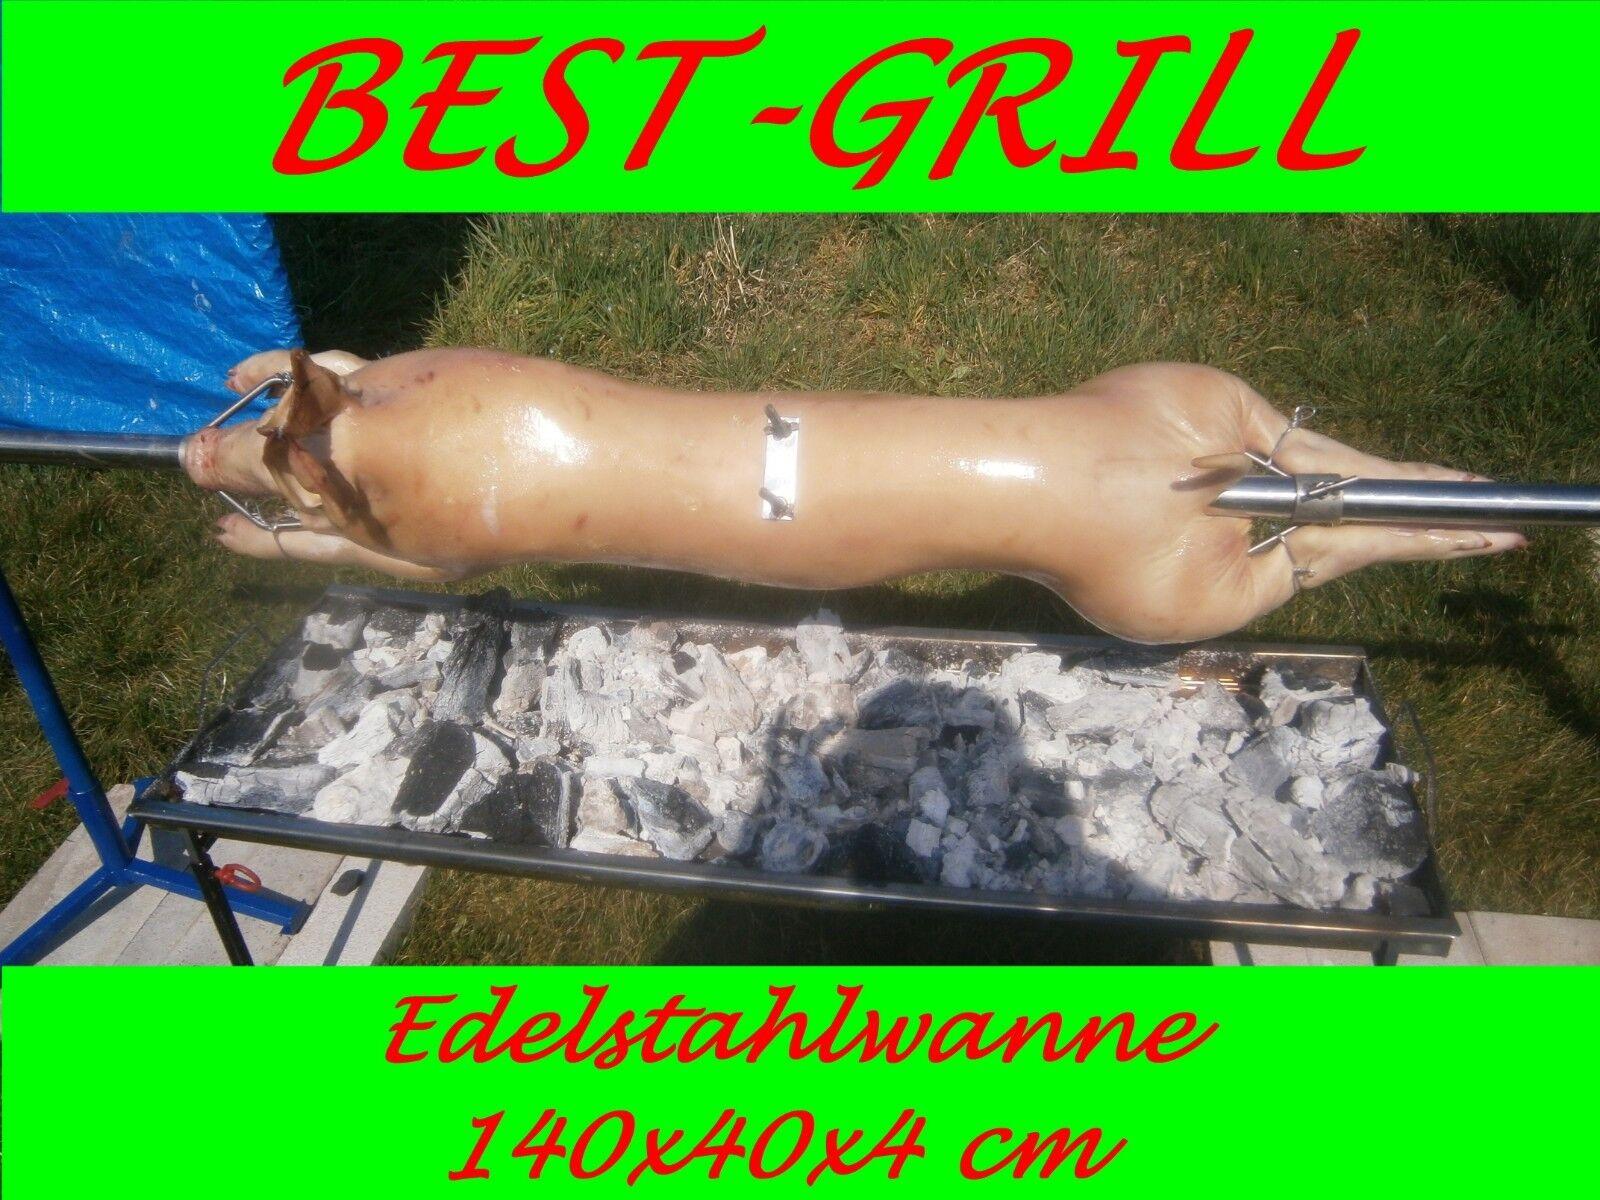 Best-Grill-XXL-spanferkelgrill, lammgrill,, tina de acero inoxidable 140 CM, 70 cm de alto